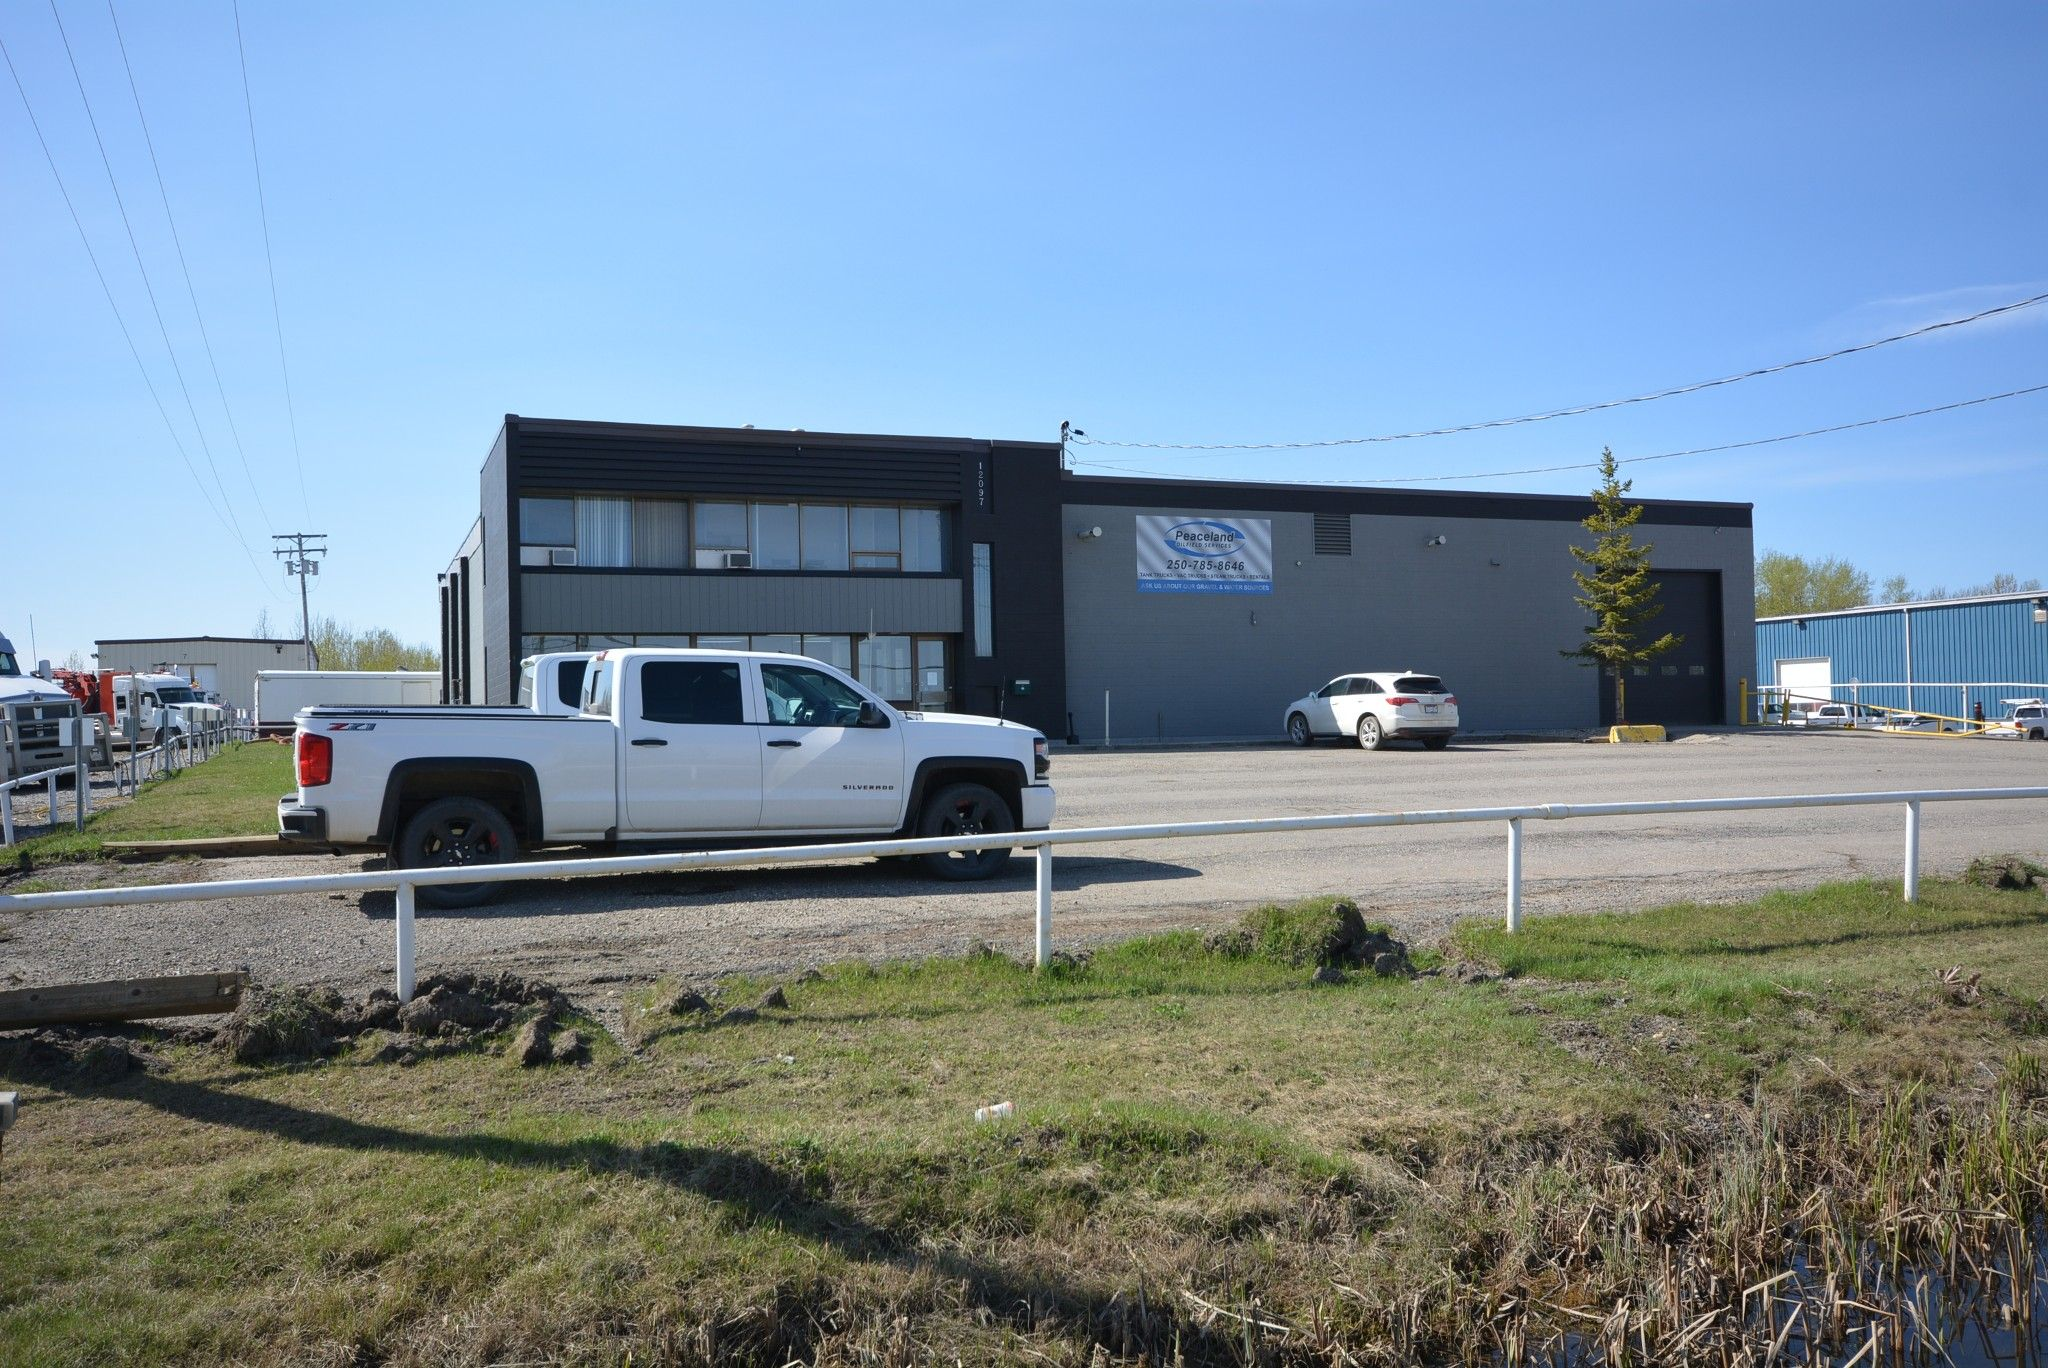 Main Photo: 12097 242 Road in Fort St. John: Fort St. John - Rural W 100th Industrial for sale (Fort St. John (Zone 60))